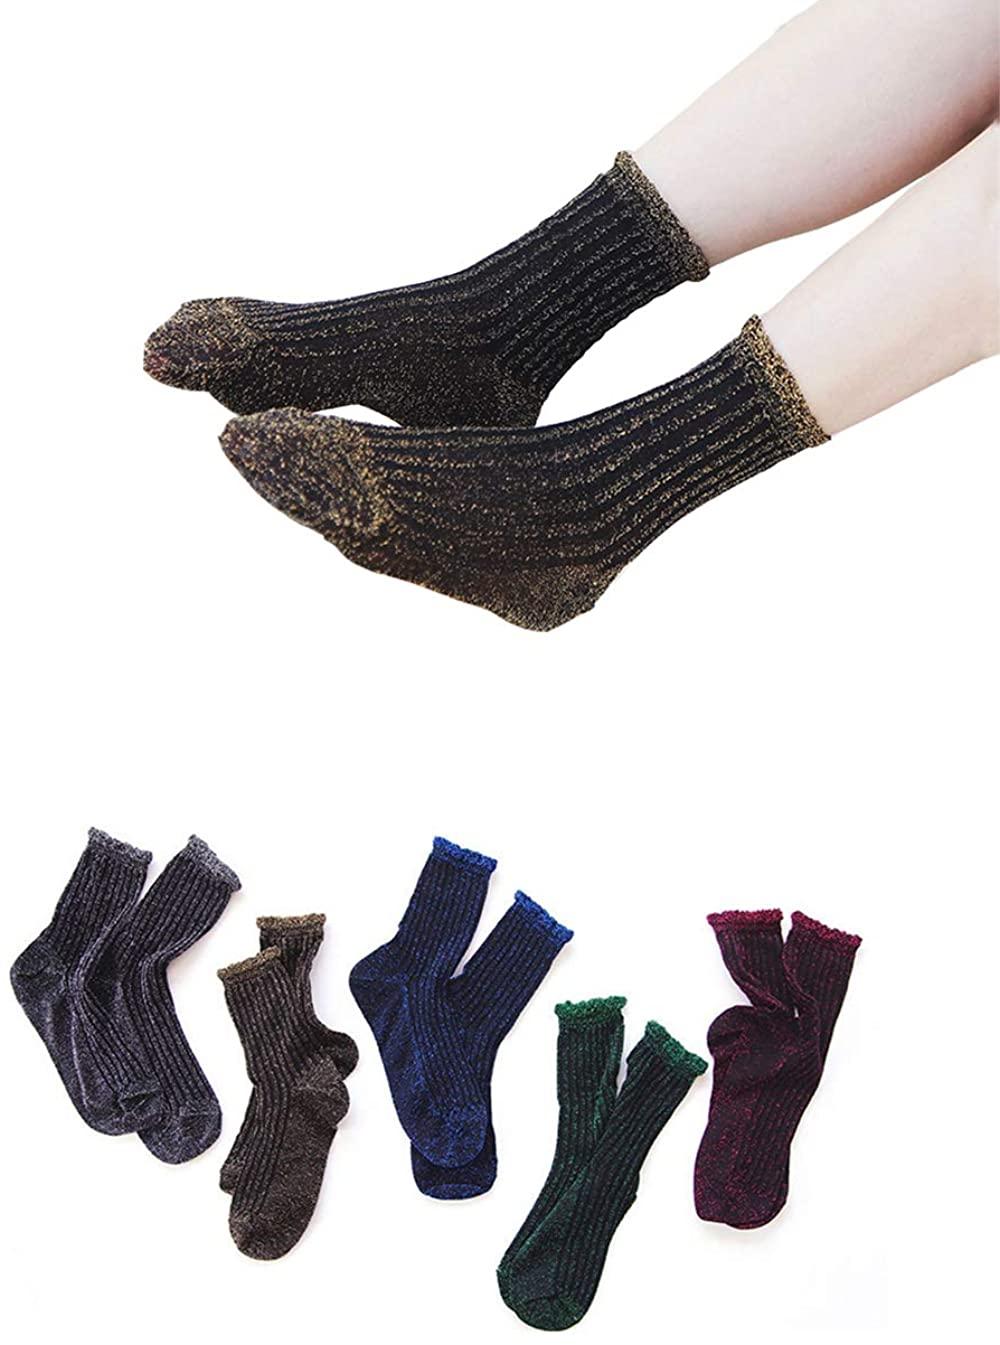 Flycheers Women's Hosiery Sparkly Shimmer Sock Ankle Socks Casual Ladies Bright Retro Sox Piles Sock 5 Pack